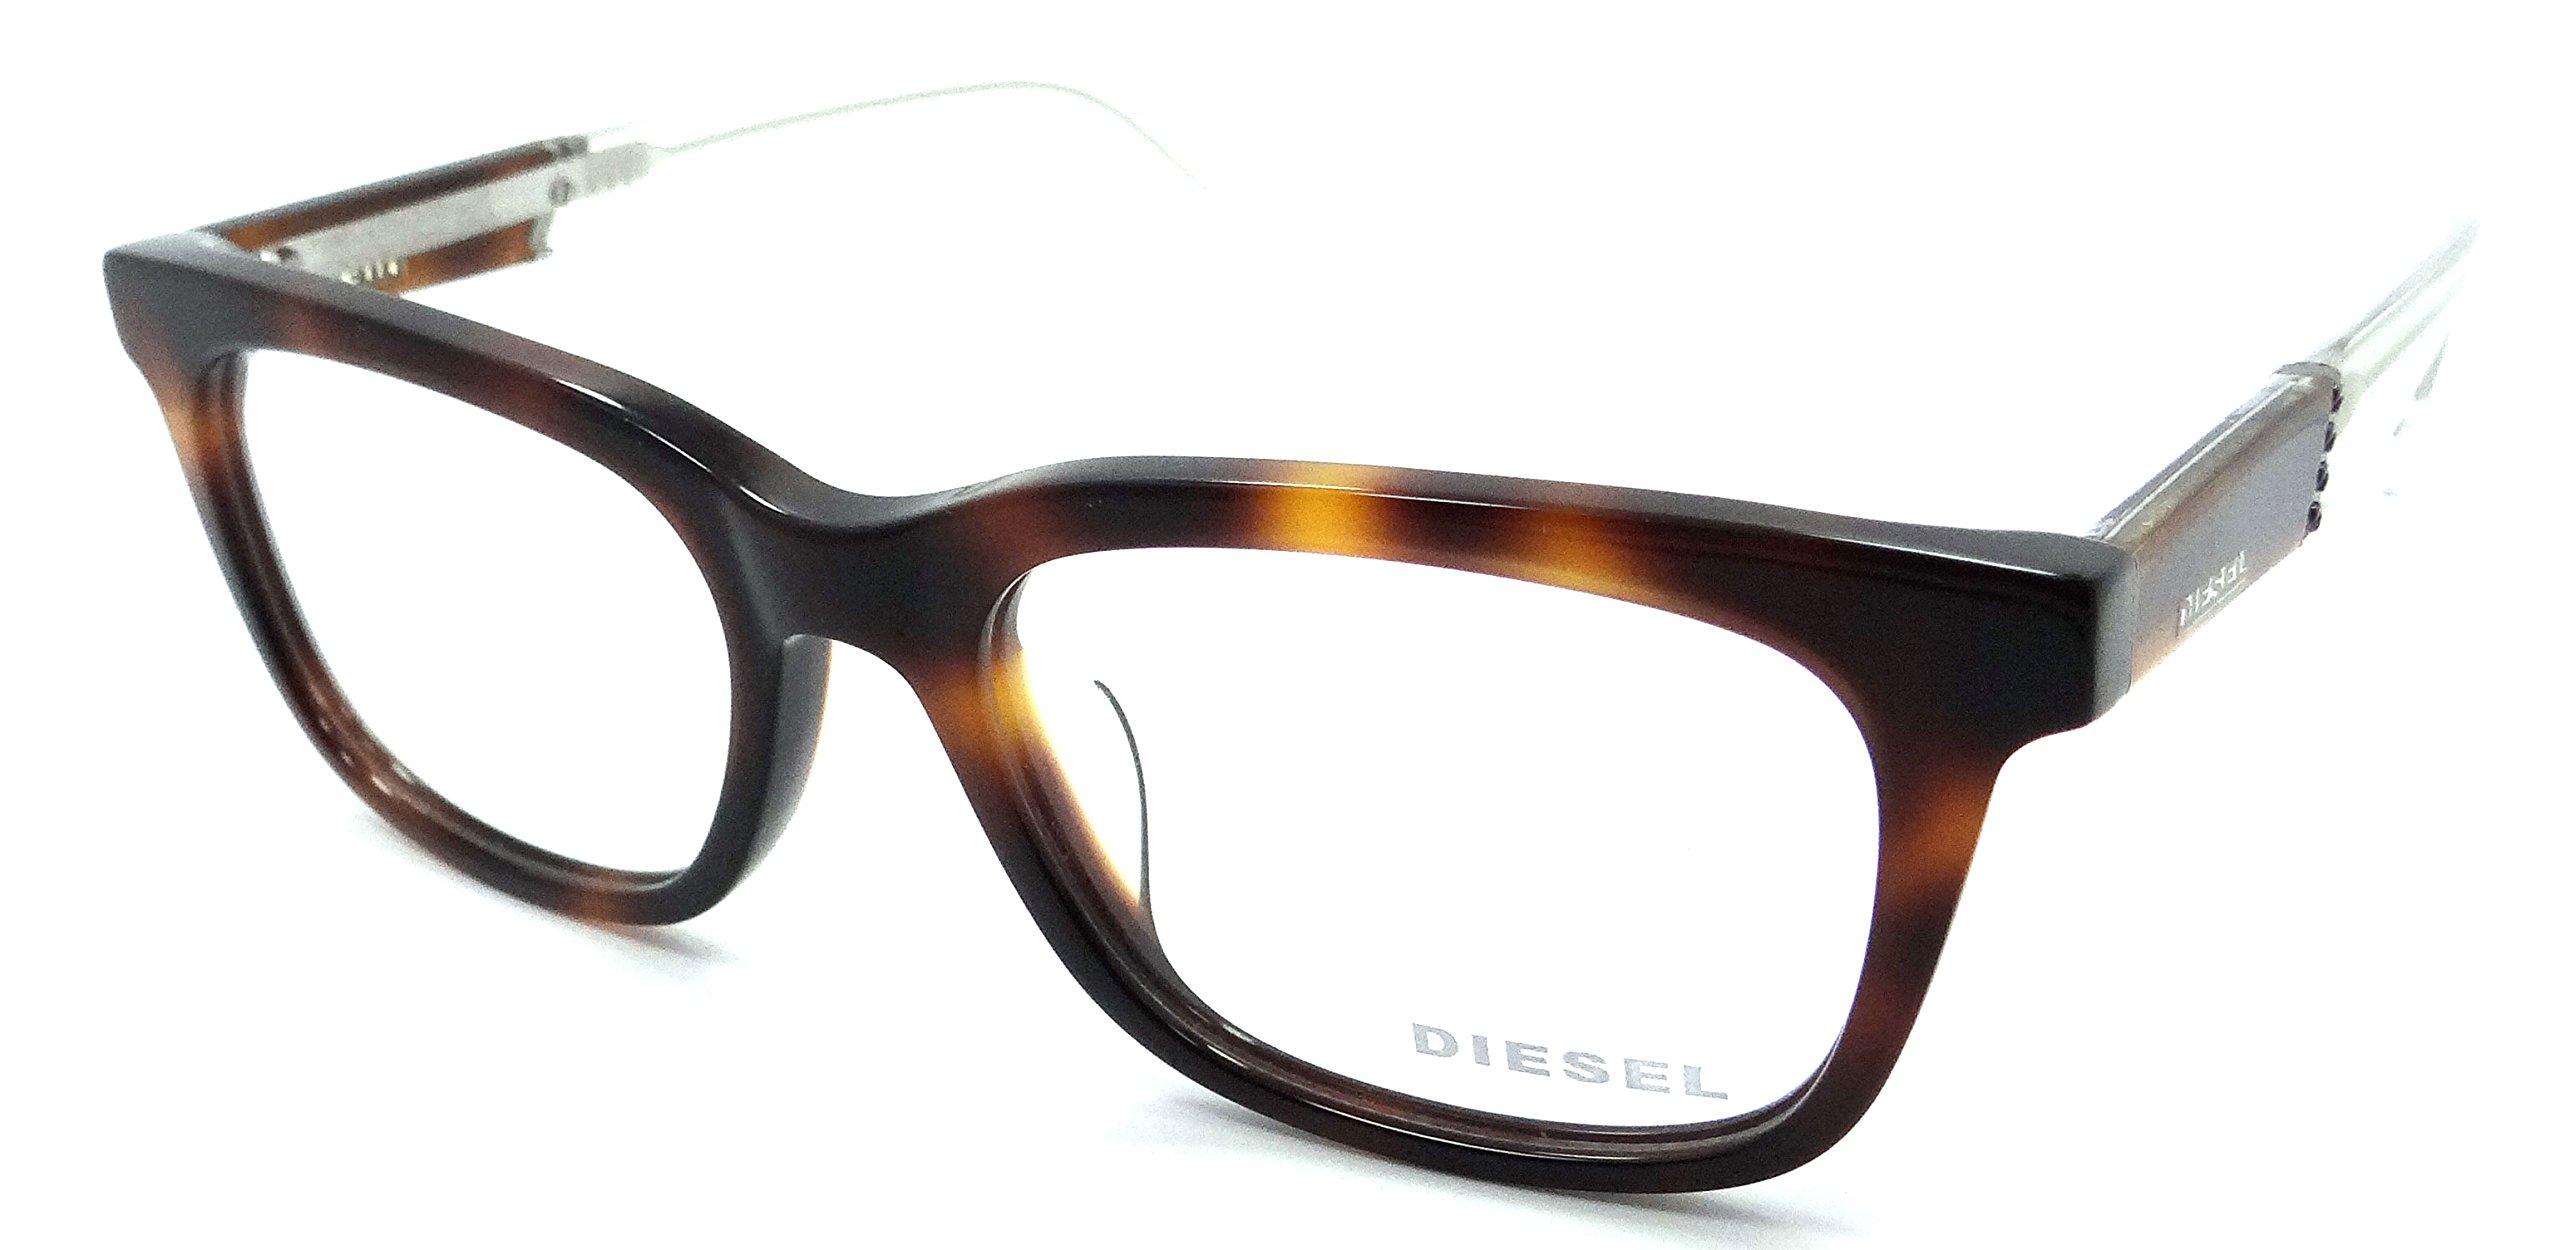 Diesel Rx Eyeglasses Frames DL5148-D 052 54-18-145 Havana / Crystal Asian Fit